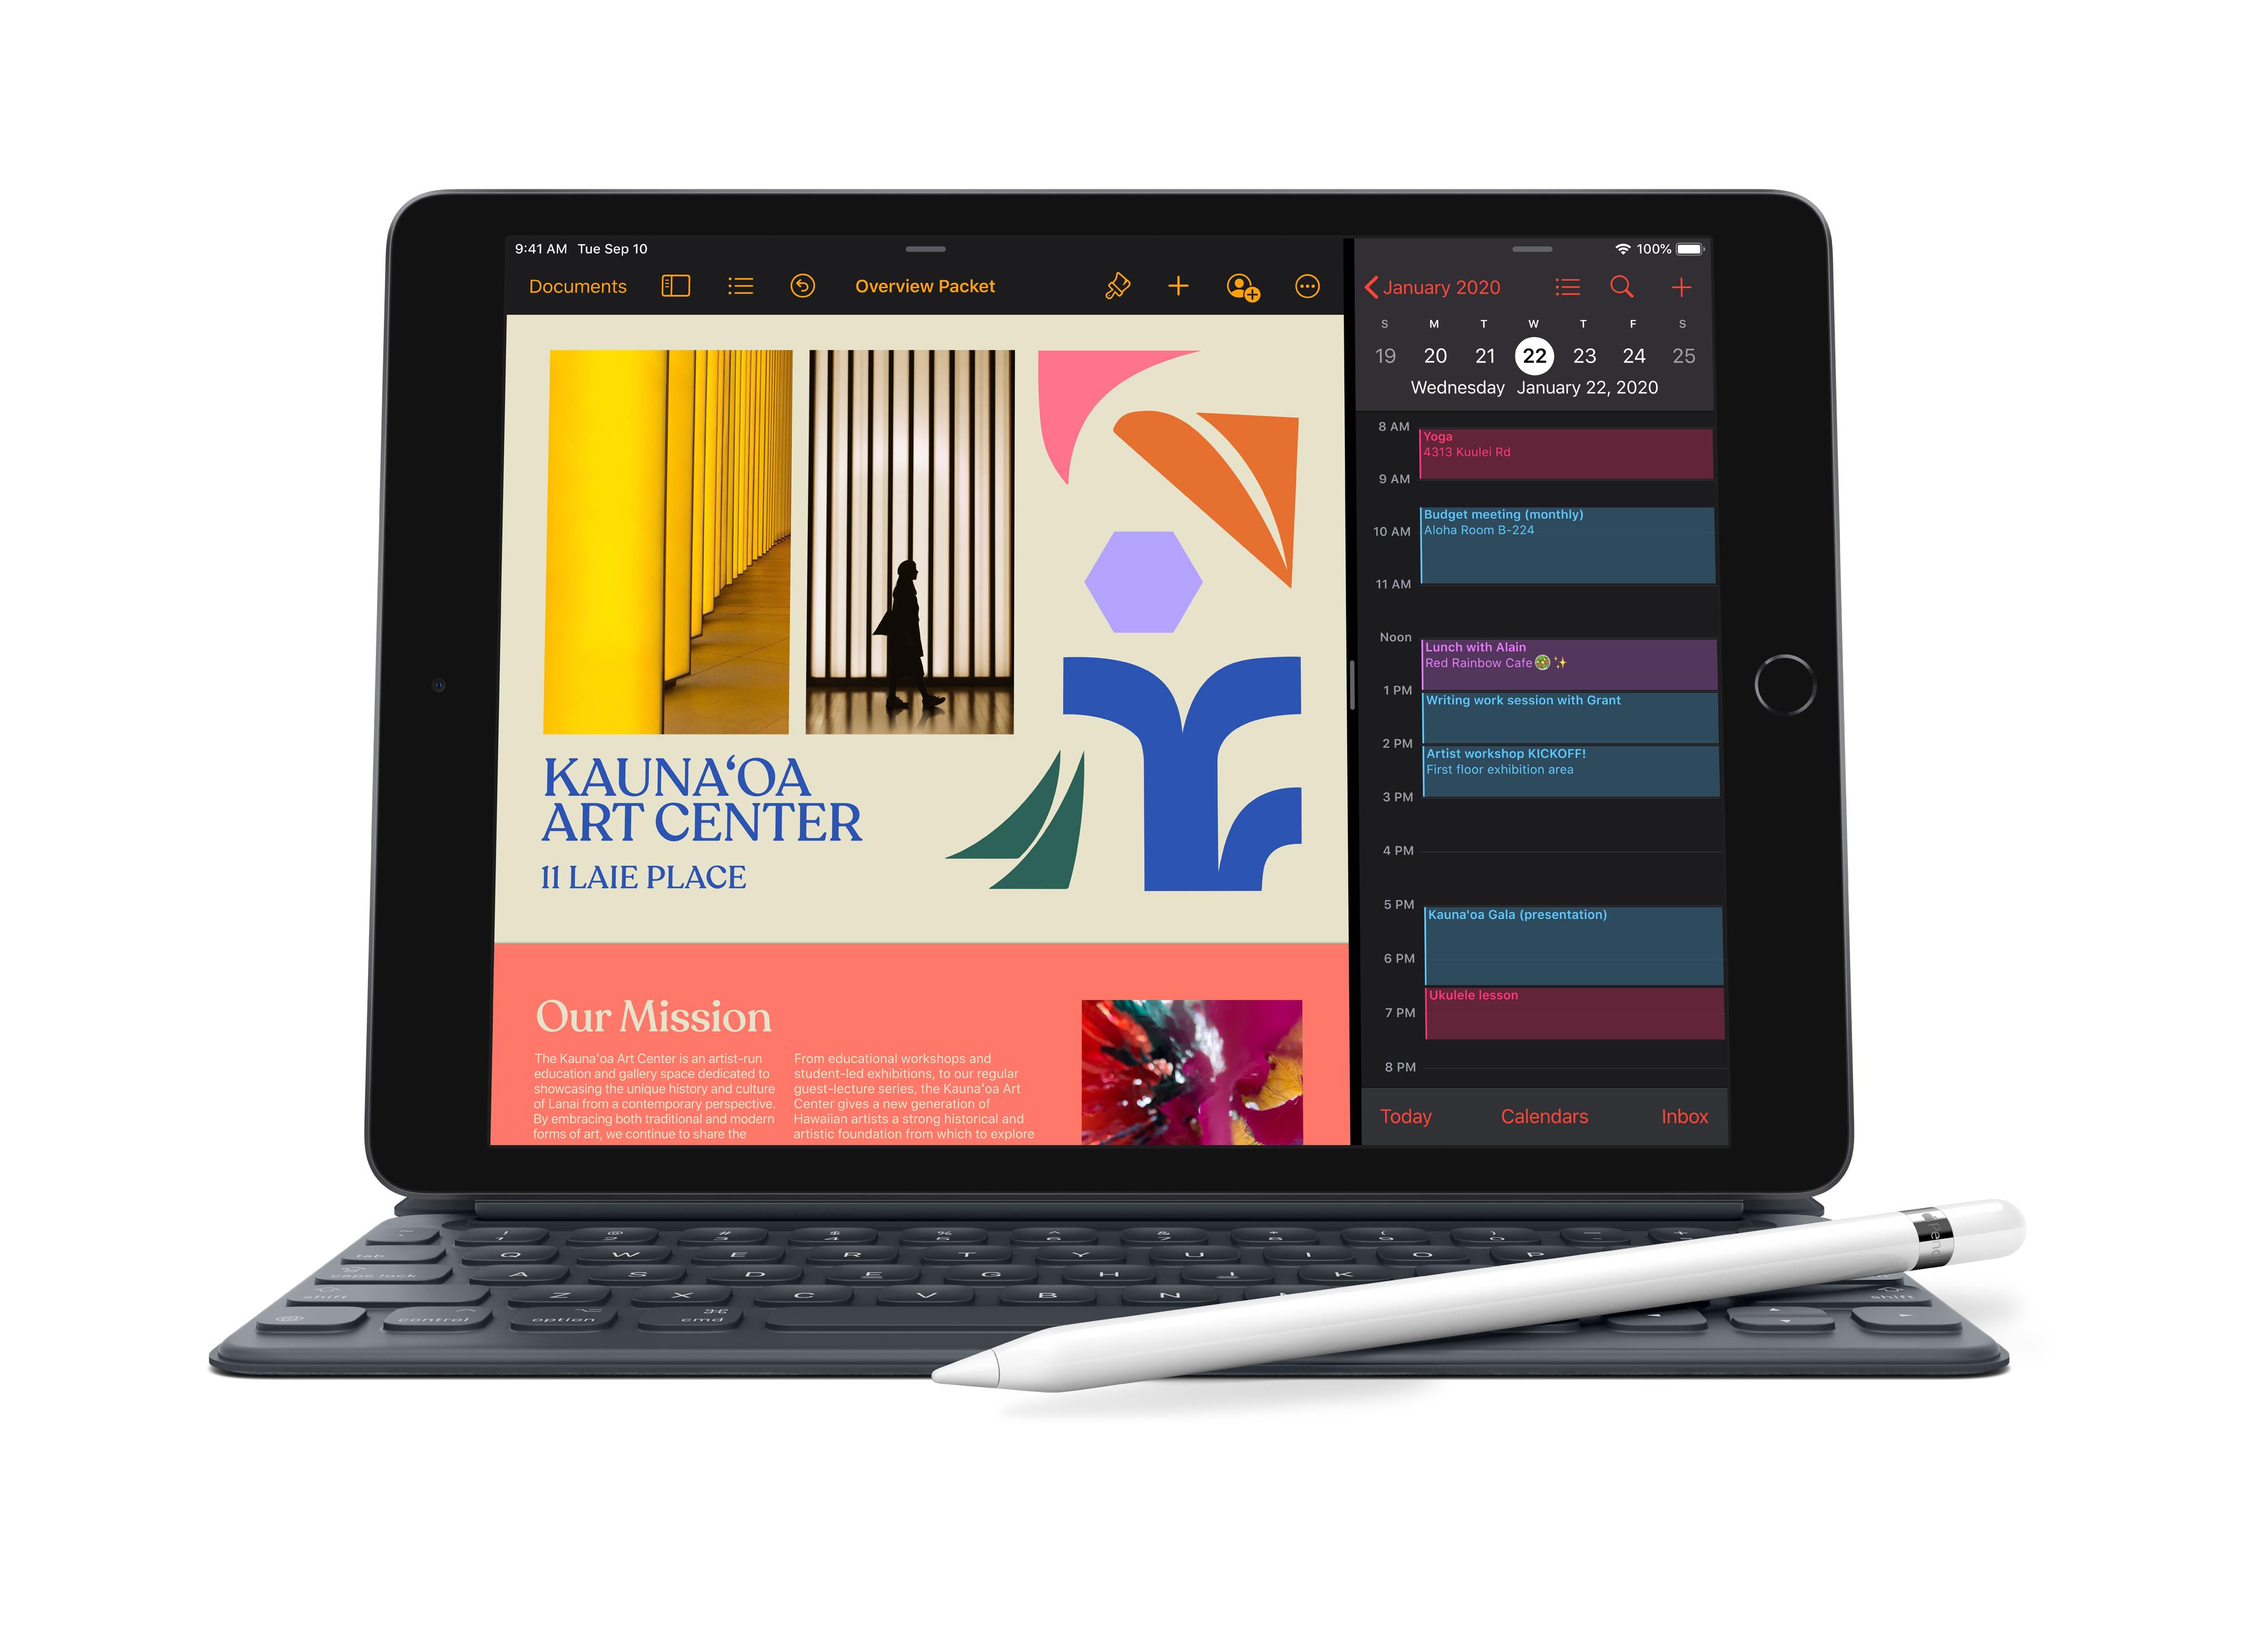 iPad_SpGry_SmartKeyboard_ApplePencil_US-EN.tif_SCREEN